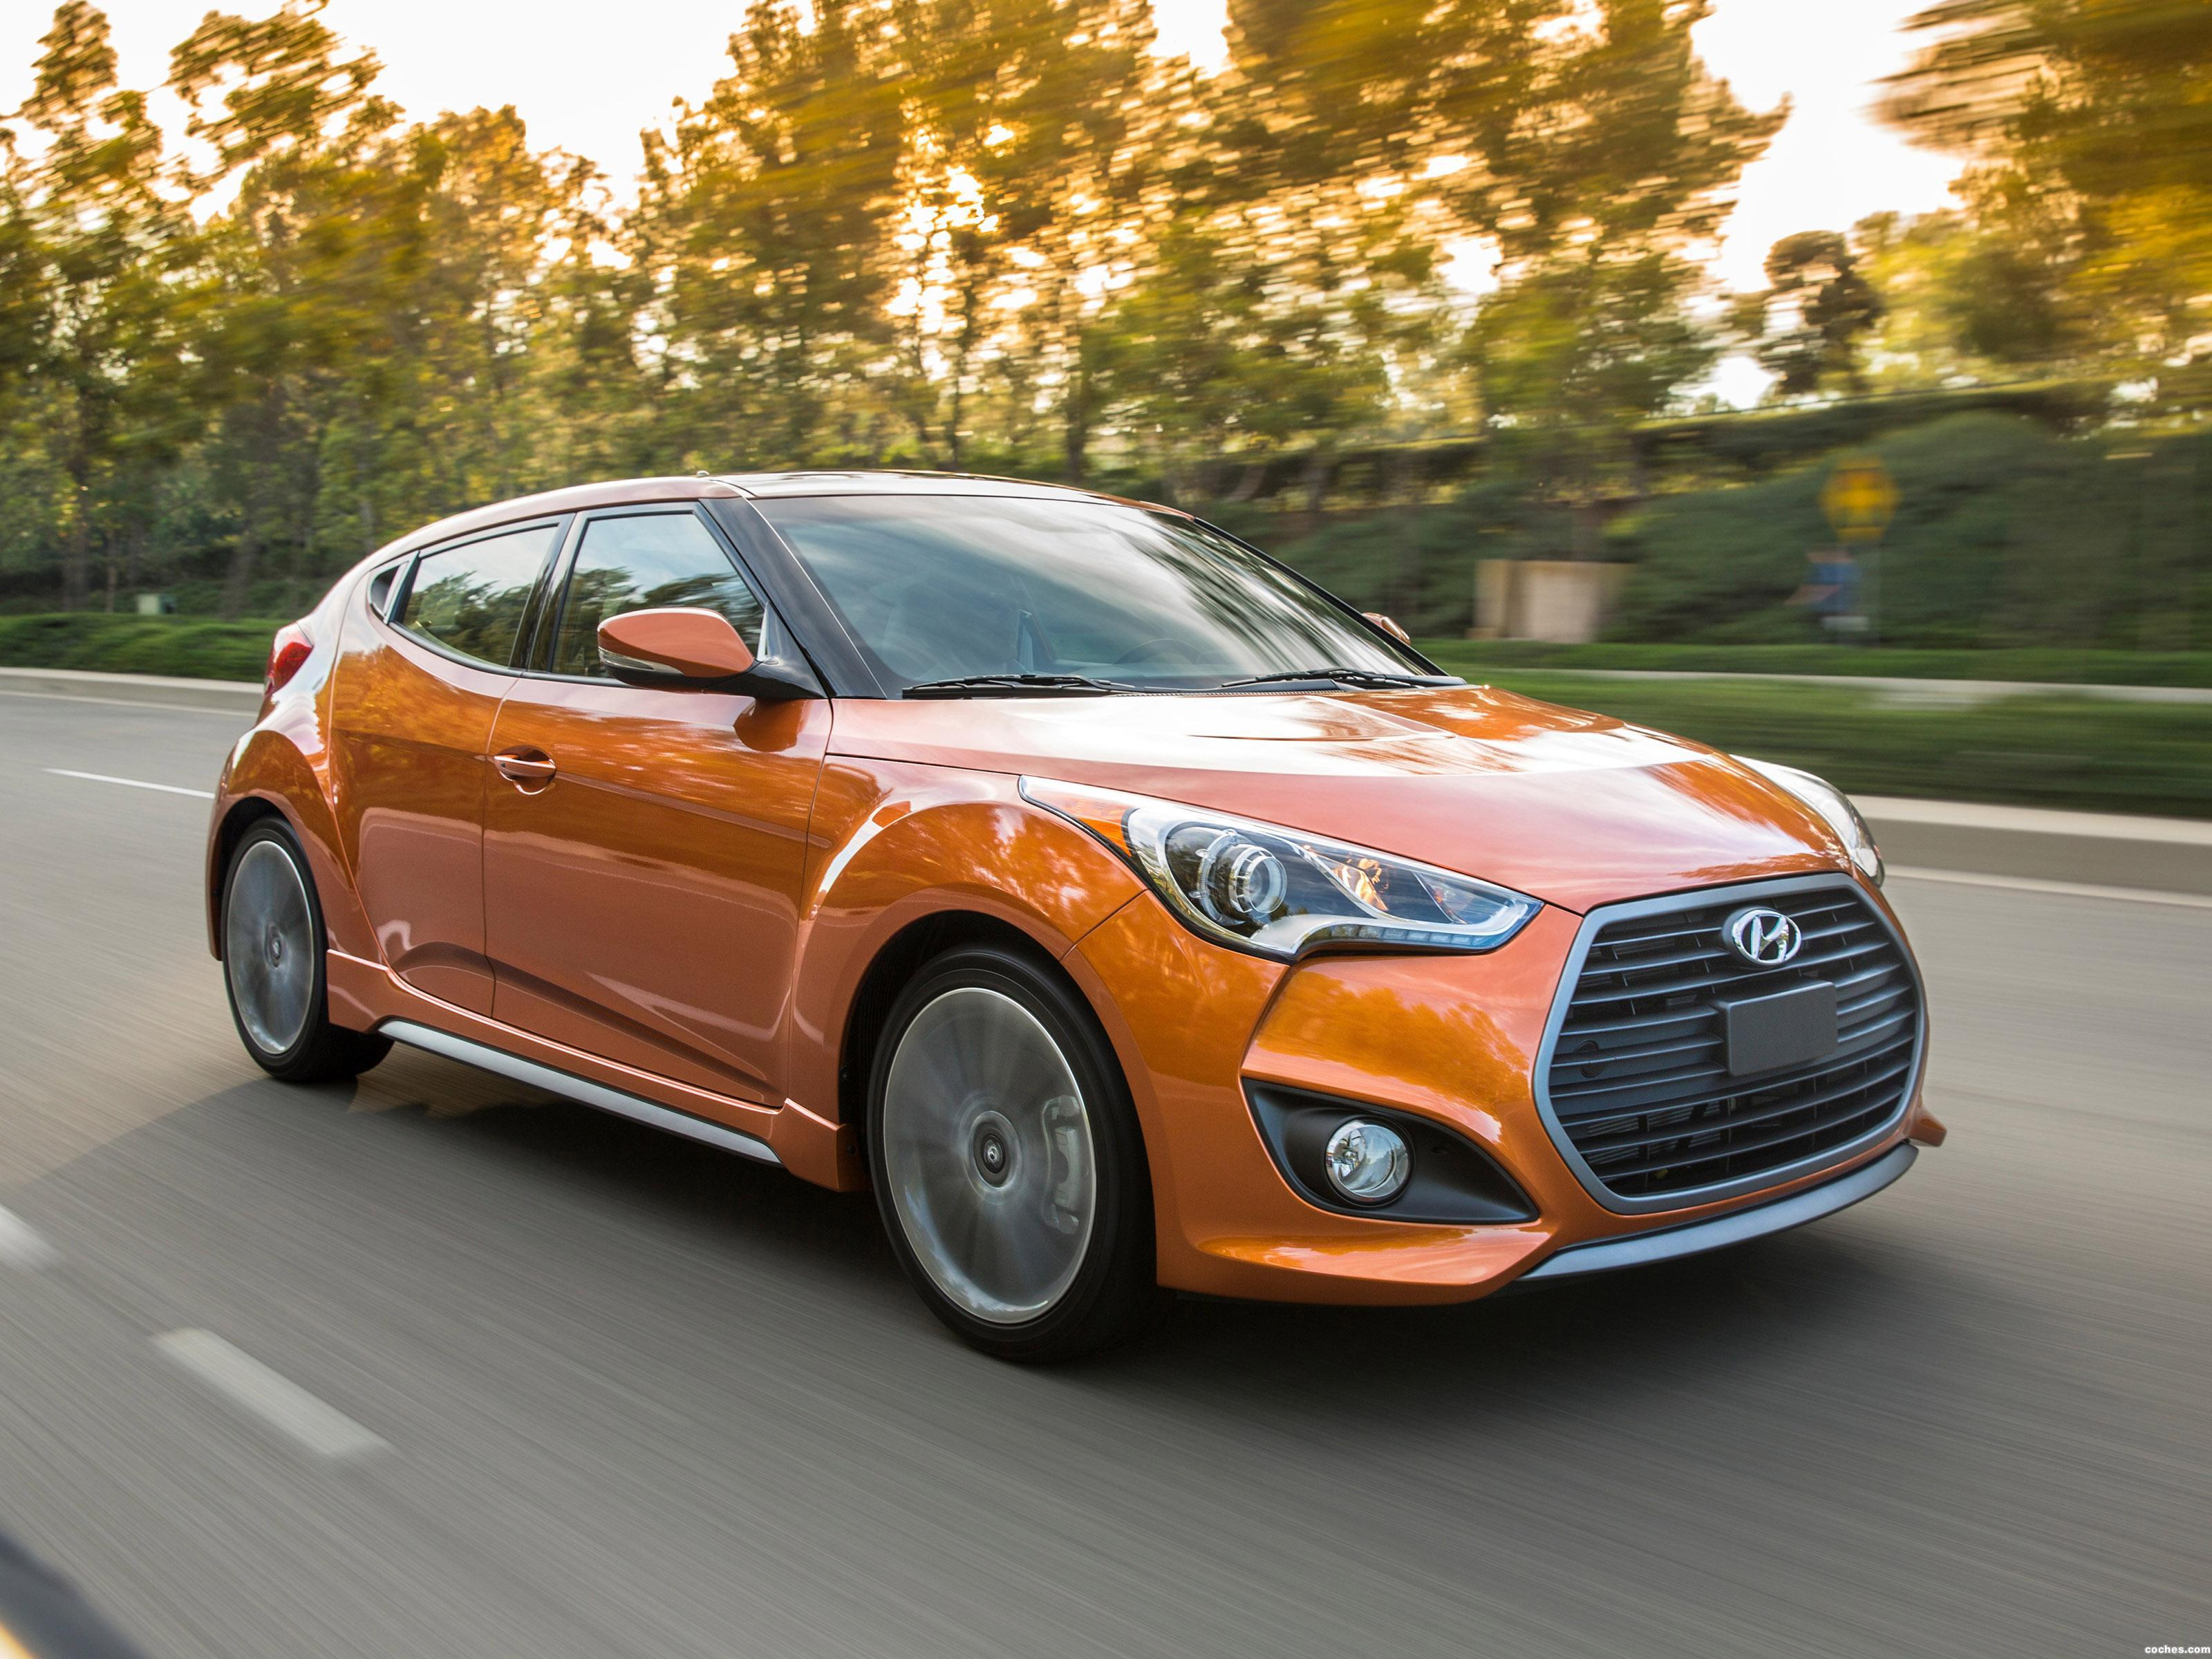 Foto 0 de Hyundai Veloster Turbo USA 2015